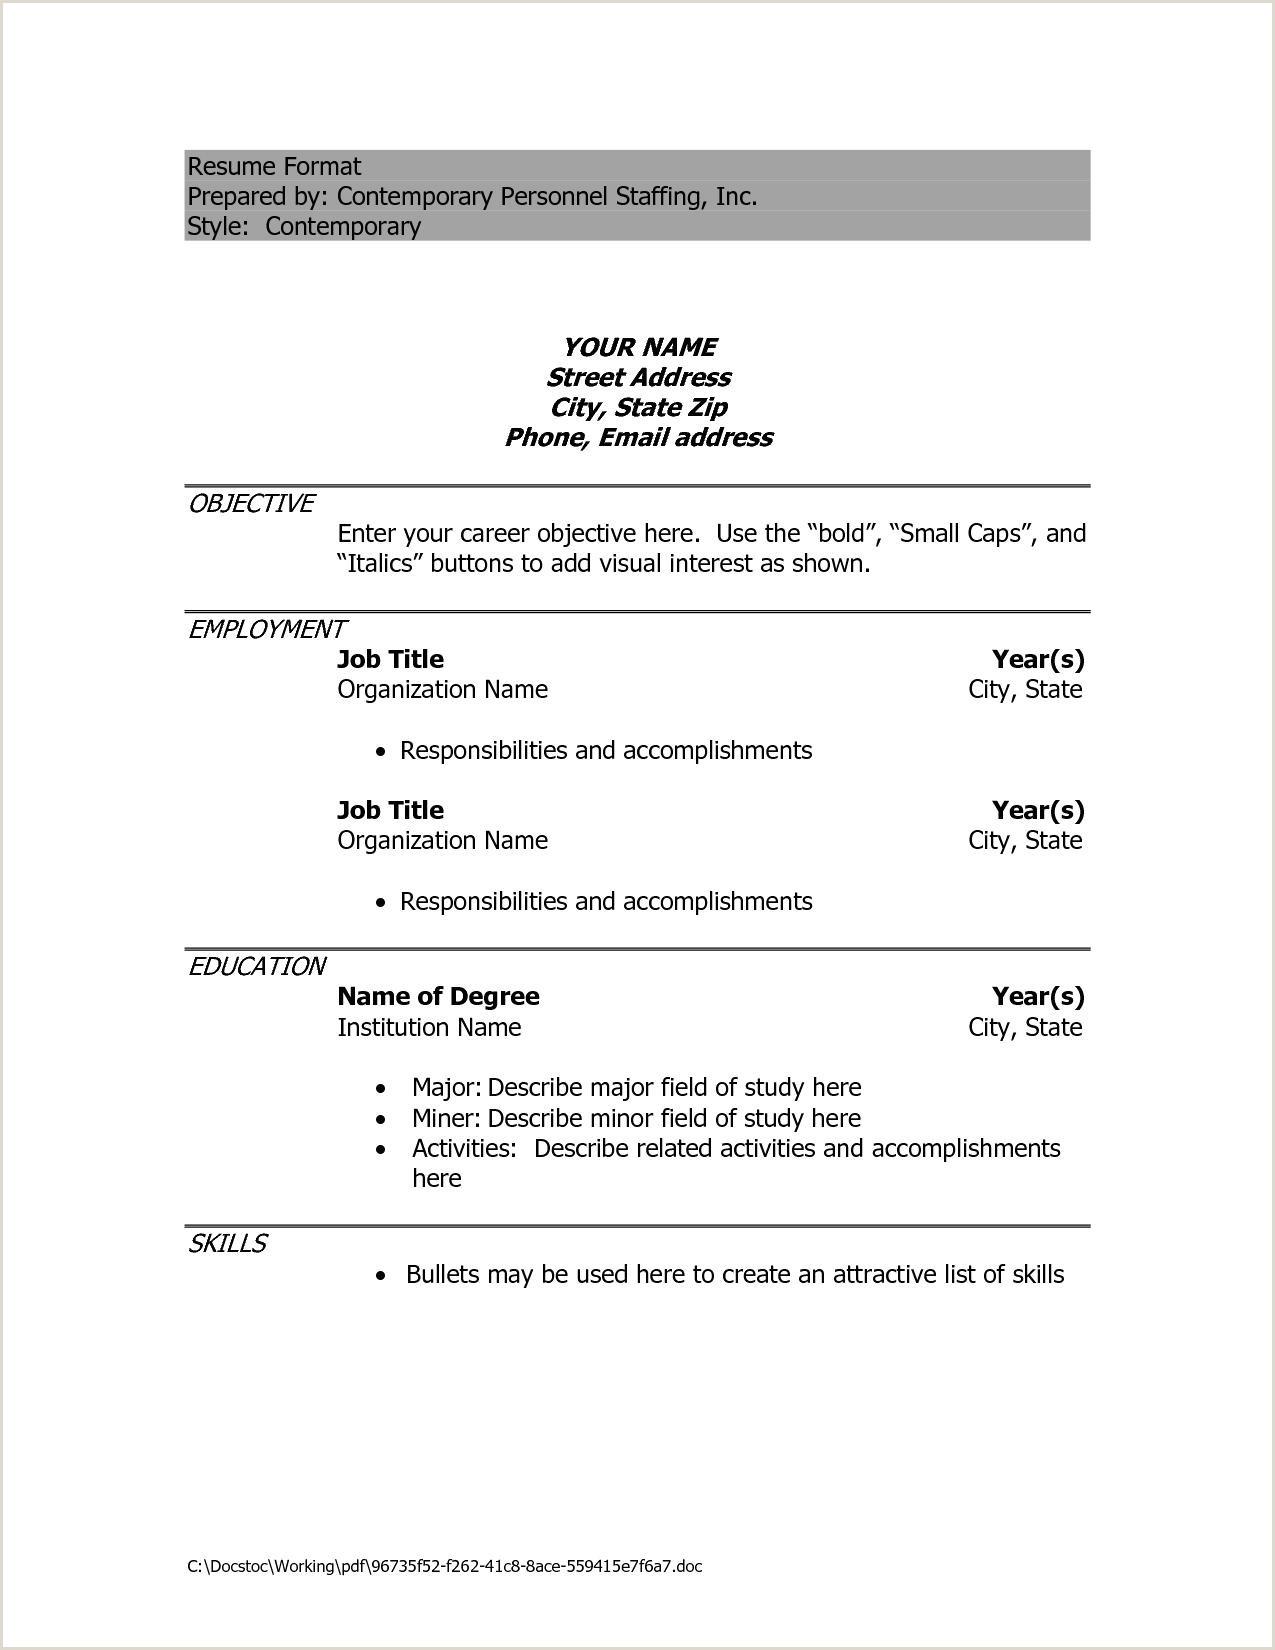 Diploma Fresher Resume format Pdf Engineering Resume format